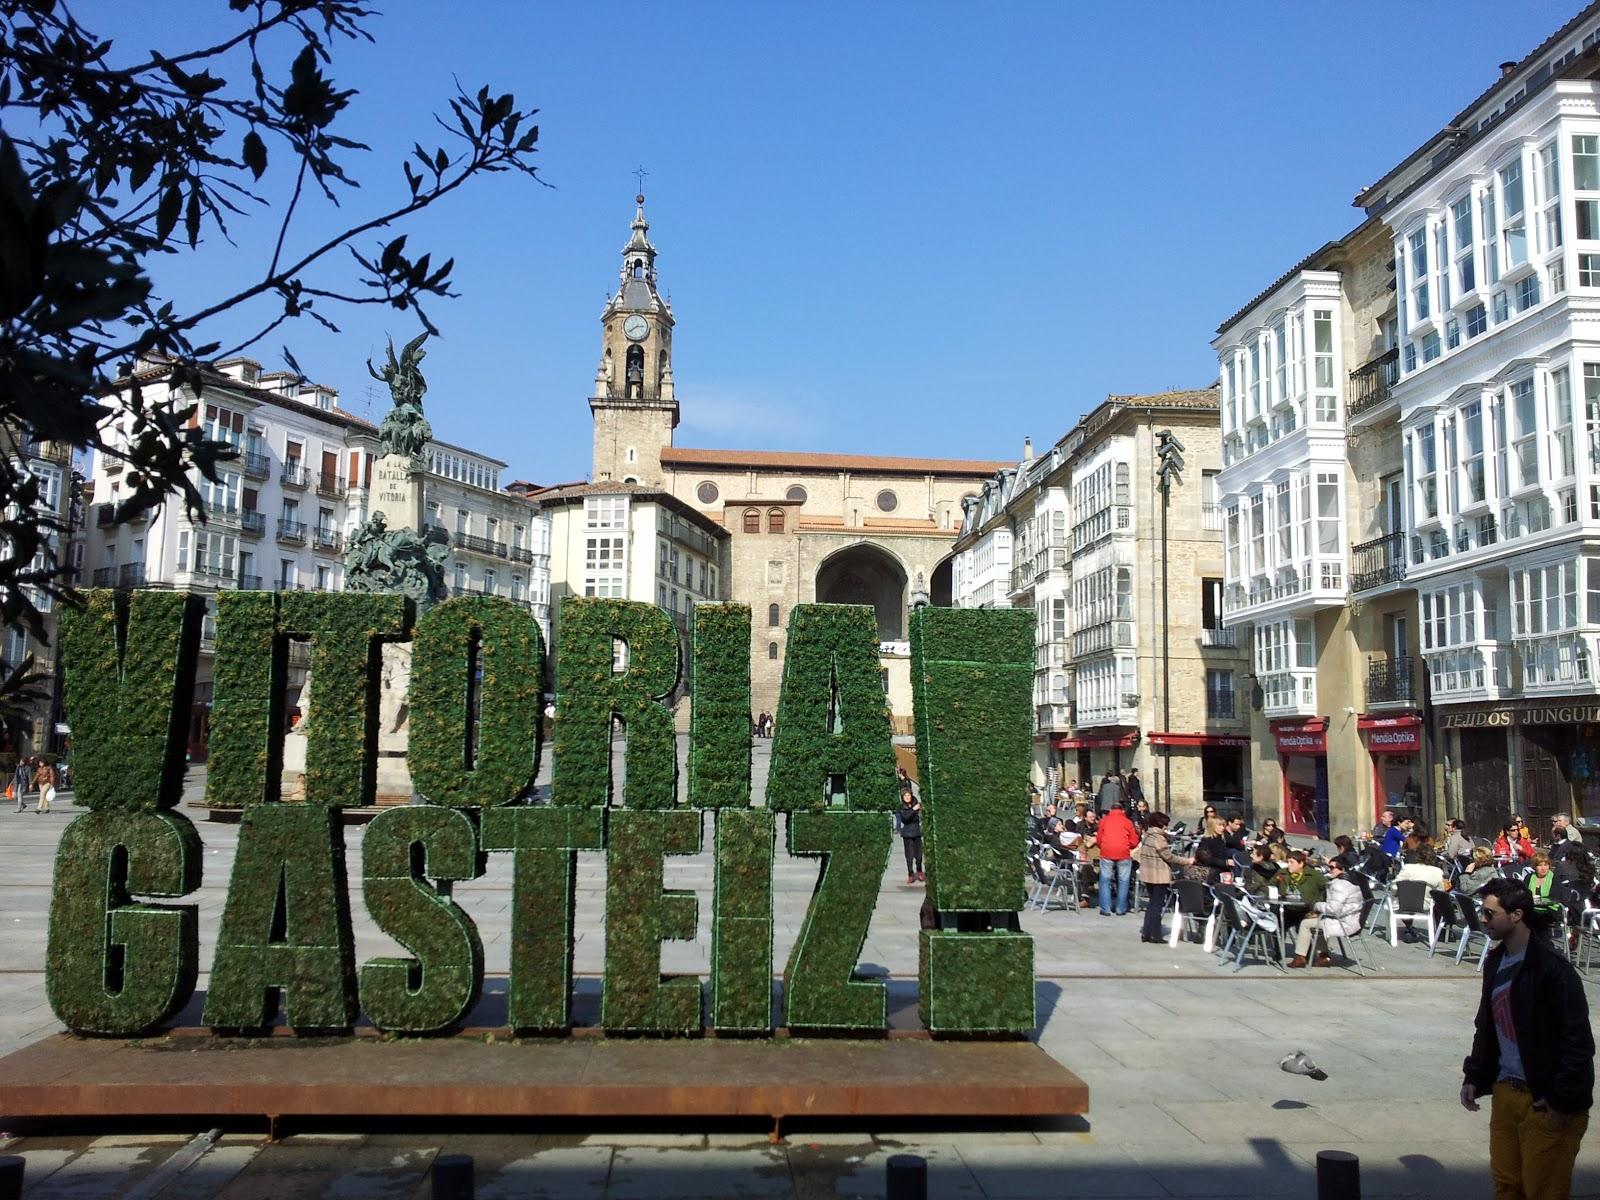 Vitoria-Gasteiz Spain  City pictures : ... Basque Private Tour Guide: European Green Capital Vitoria Gasteiz